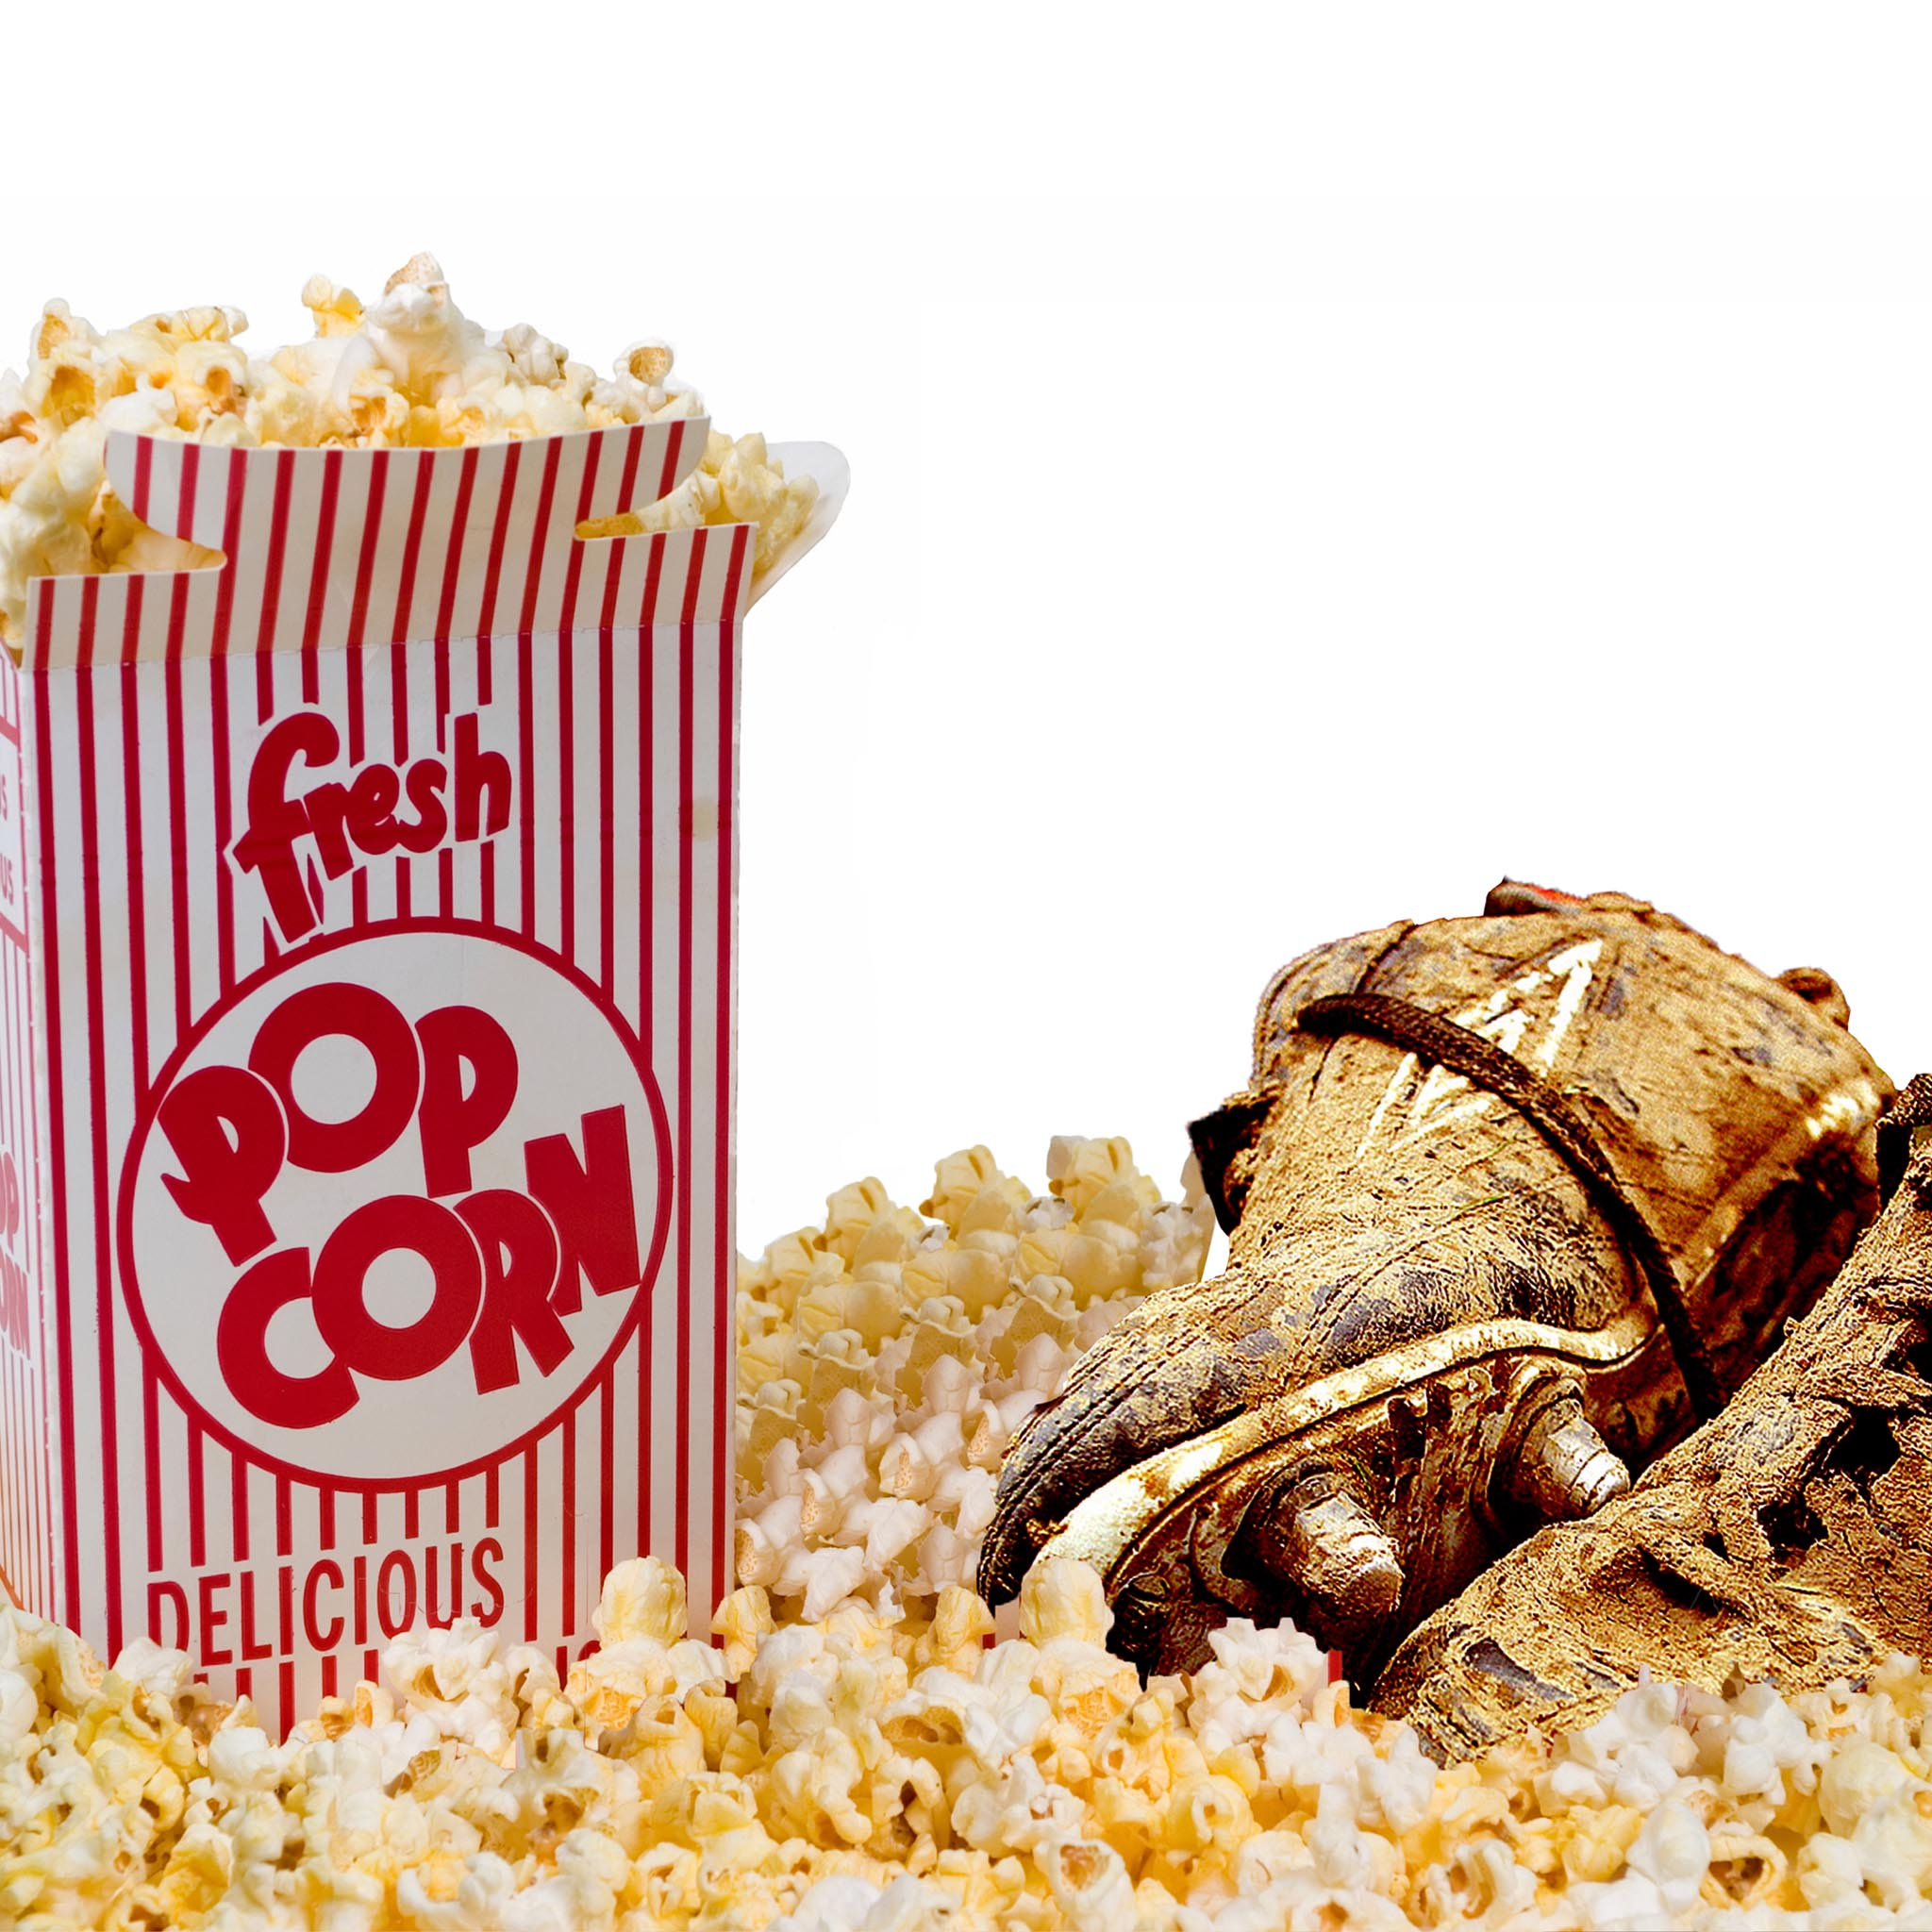 Popcorn & Cleats